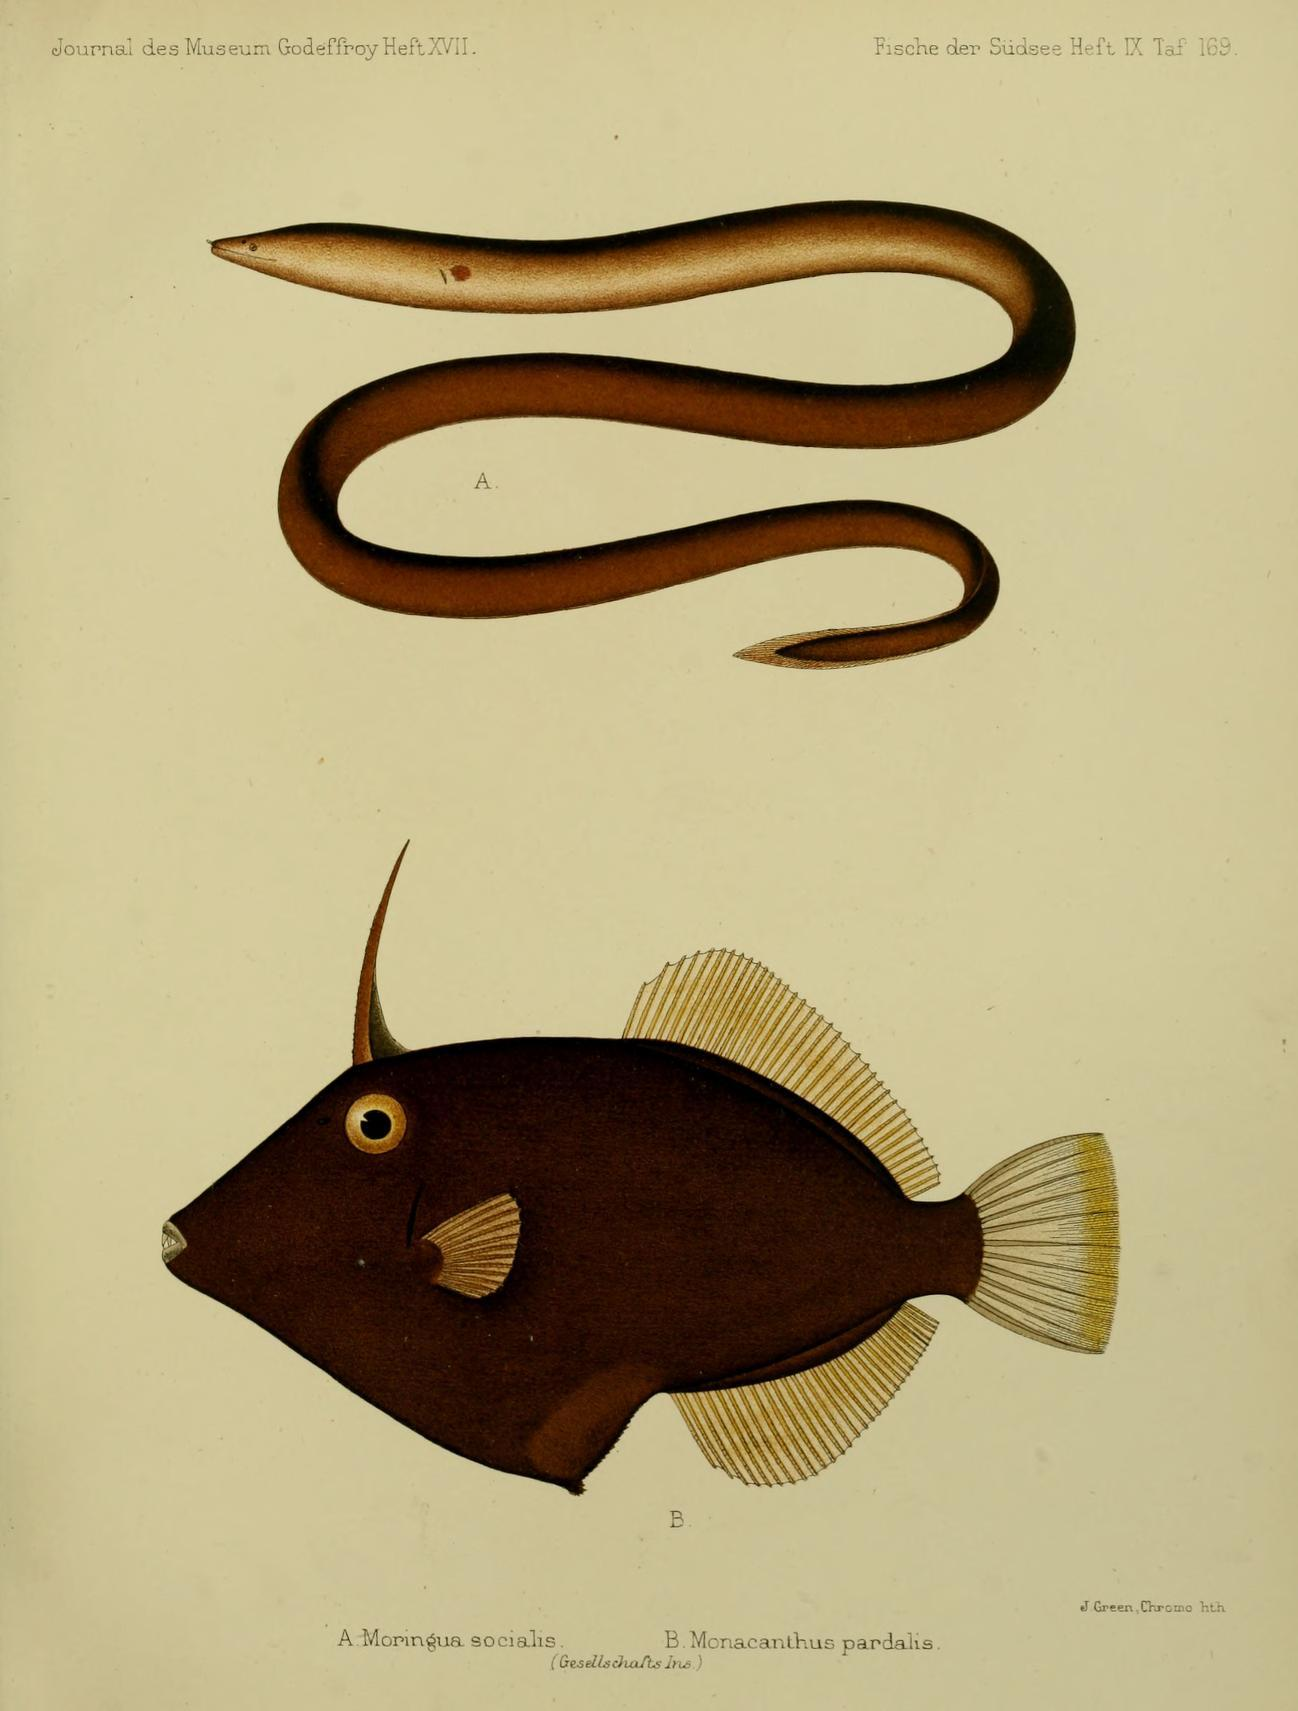 Image of Honeycomb Filefish